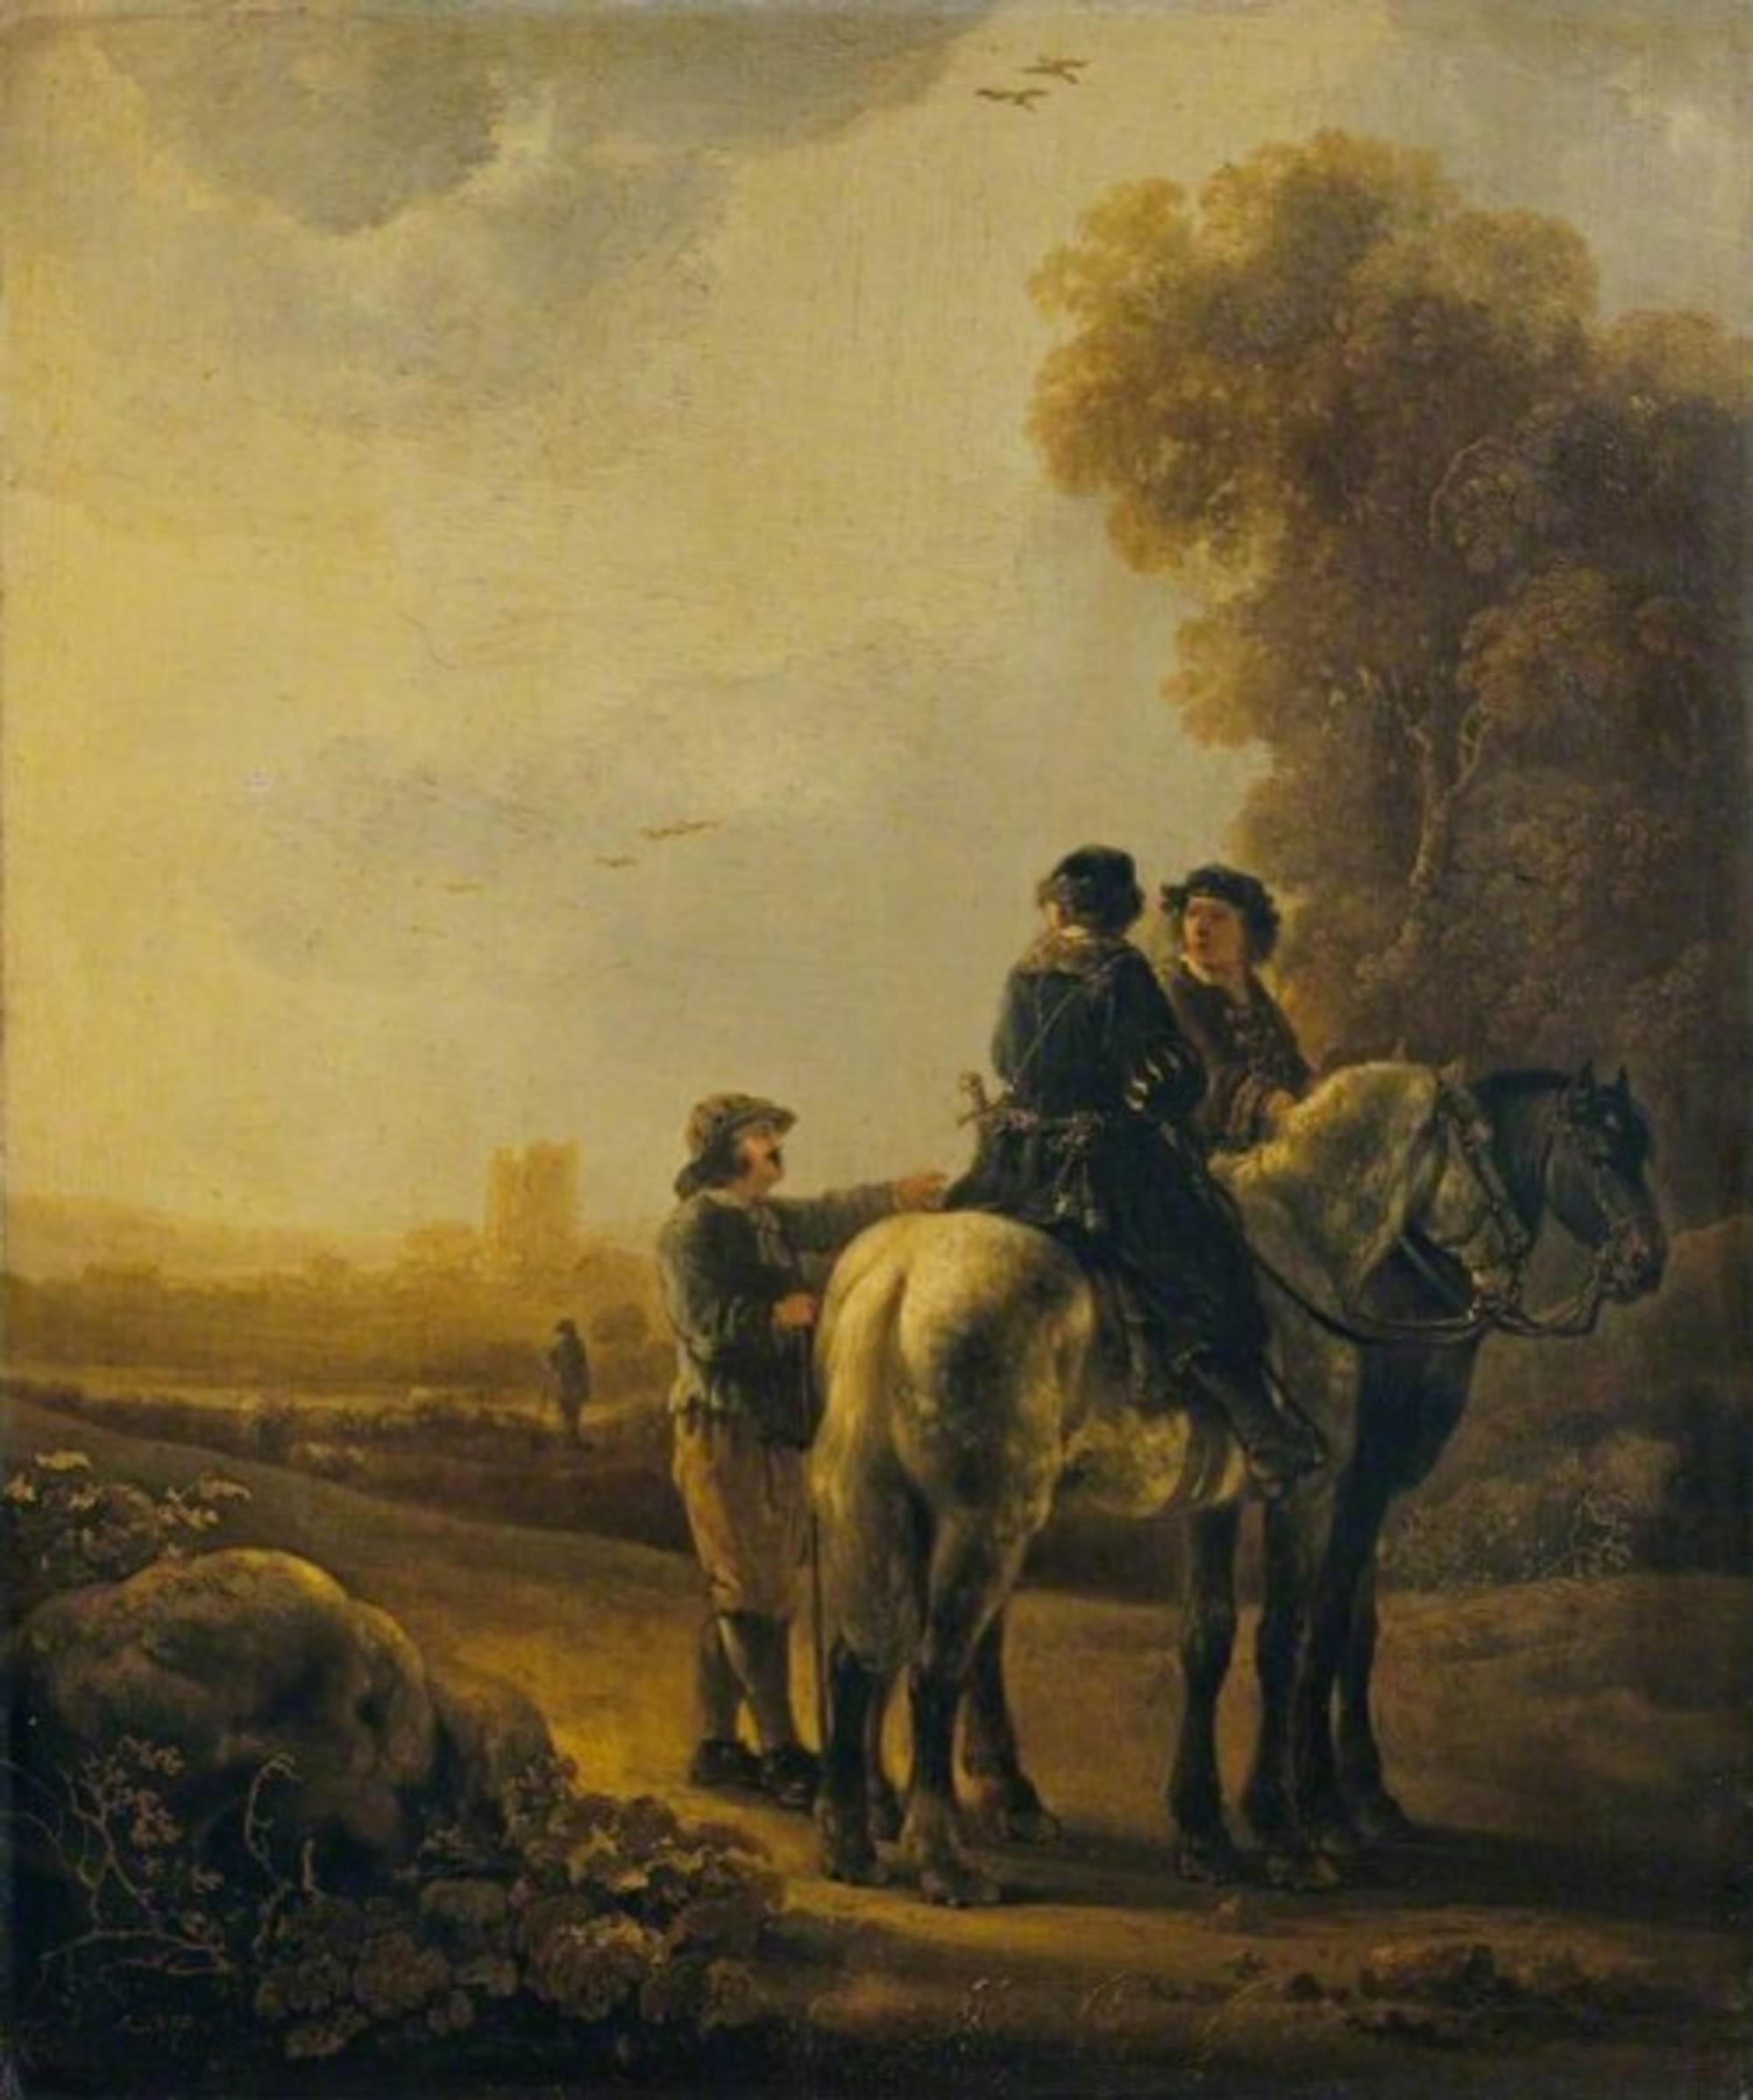 Aelbert-Cuyp---Horsemen-in-a-Landscape-WLC-WLC-P253.jpg